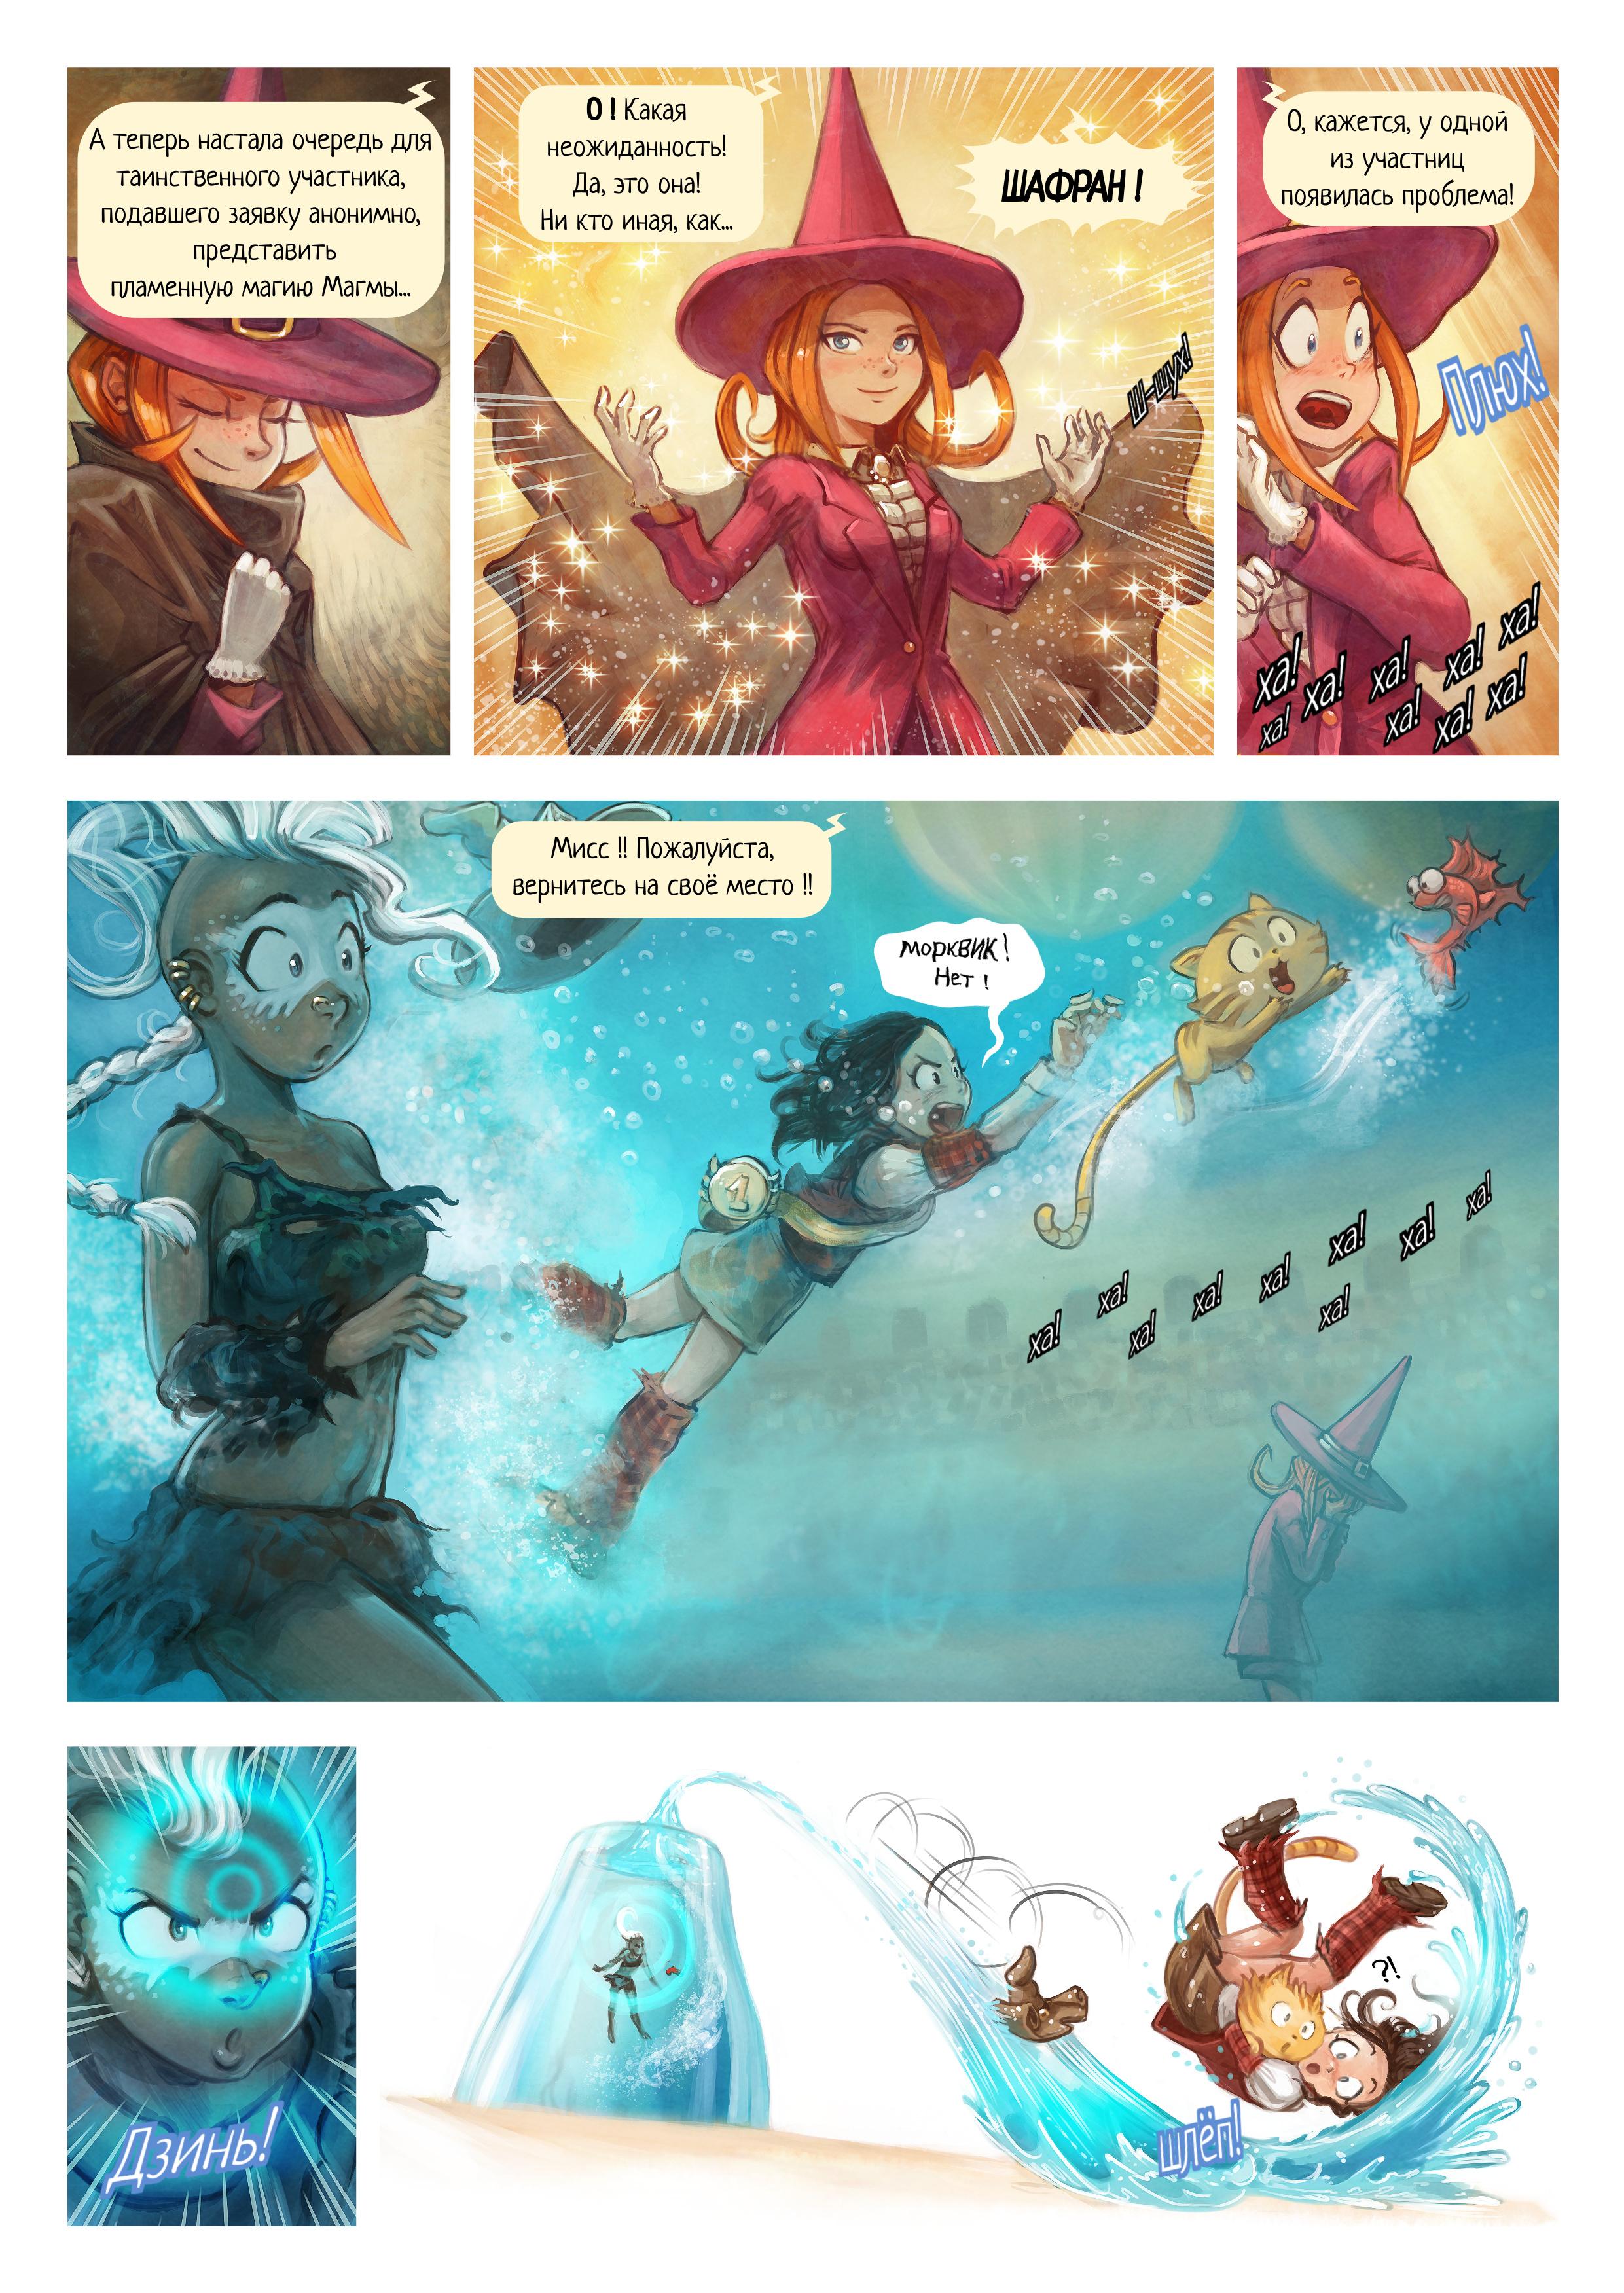 A webcomic page of Pepper&Carrot, эпизод 21 [ru], стр. 6